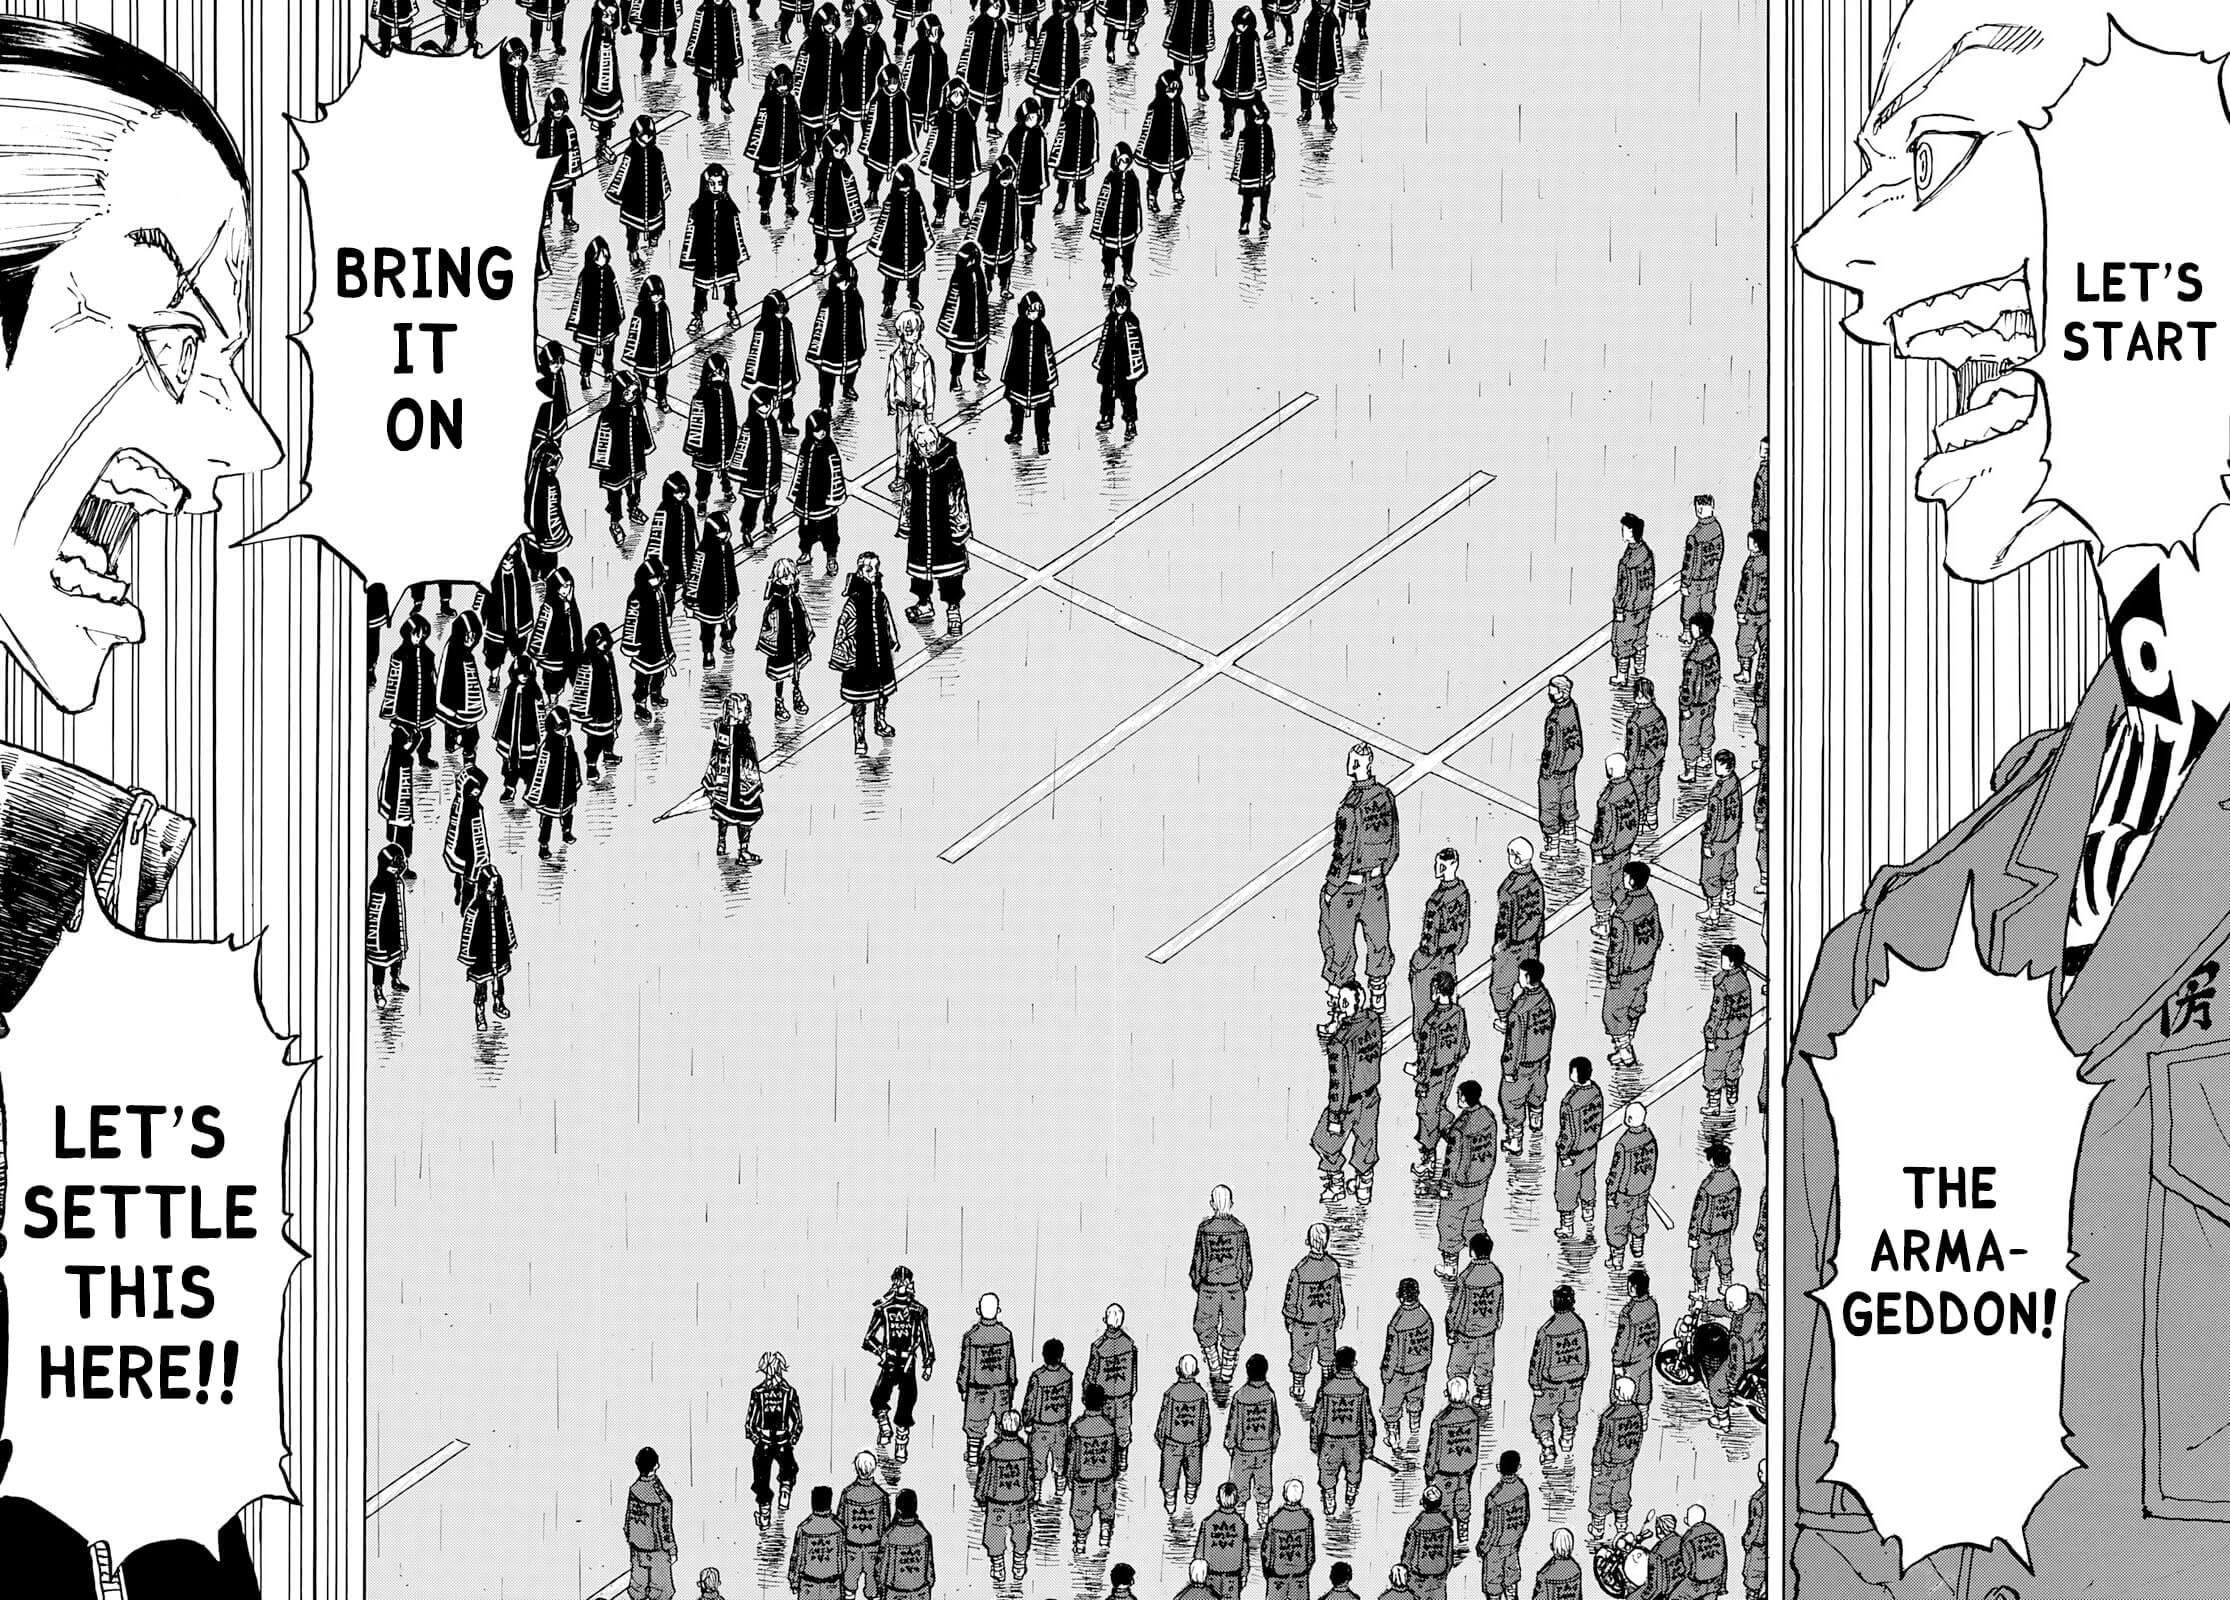 tokyo manji revengers anime, tokyo manji revengers characters, tokyo revengers, tokyo revengers manga, tokyo revenger, draken tokyo revengers, tokyo revengers anime, tokyo revengers manga online, mangaclash, tokyo revengers reddit, tokyo revengers anime reddit, tokyo revengers anime release date, tokyo revengers release date, tokyo revengers read online, tokyo manji revengers manga, read manga, read attack on titan 137, attack on titan final season, tokyo majin revengers manga, read tokyo majin revengers manga online, read tokyo majin revengers manga, tokyo majin revengers manga reddit, tokyo majin revengers anime, tokyo majin revengers chapter 195, tokyo majin revengers 195, tokyo majin revengers 195 reddit, manga, read Tokyo 卍 Revengers, read Tokyo Revengers, chapter, chapters